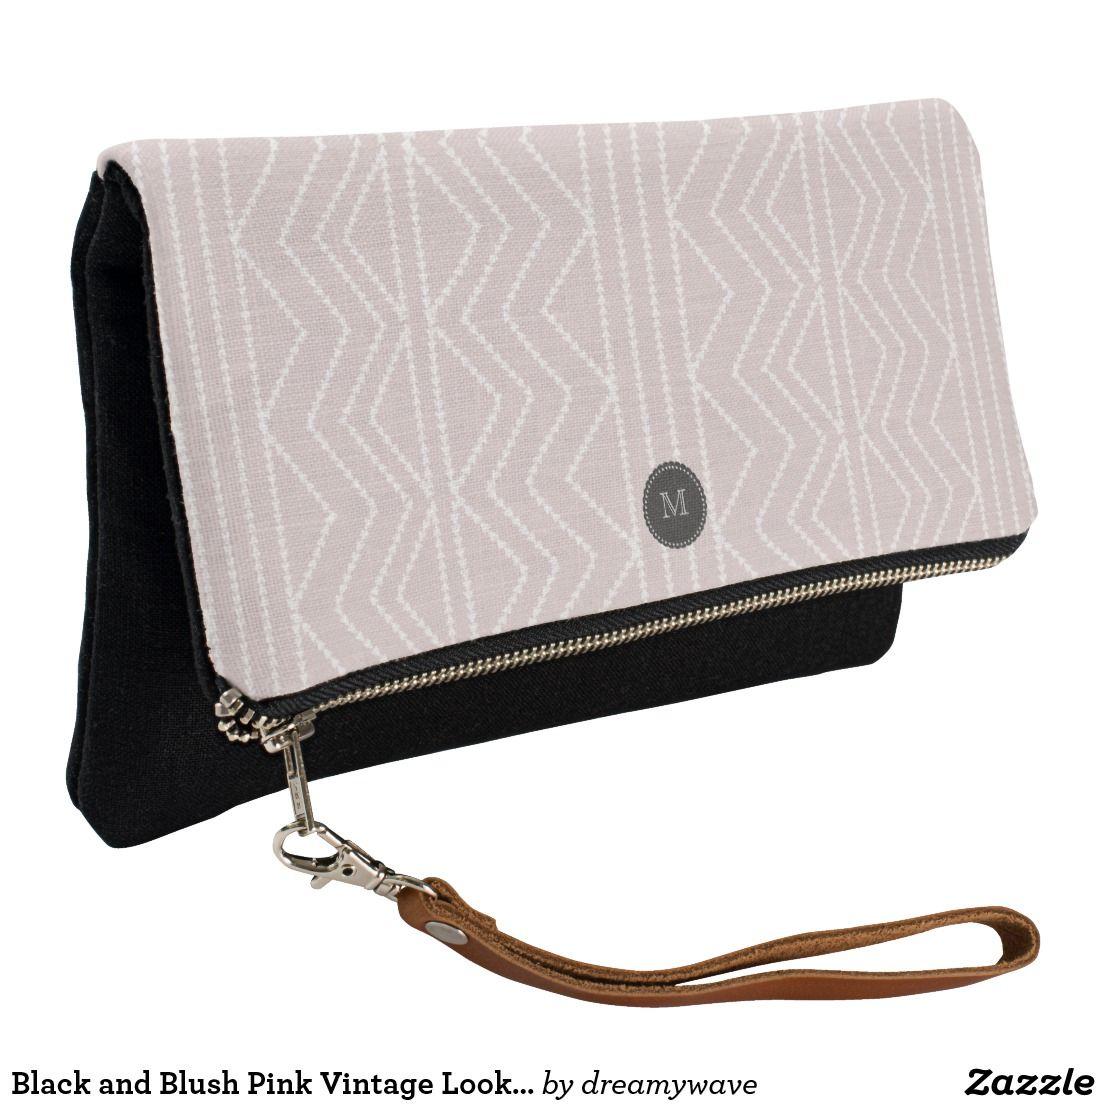 Black and Blush Pink Vintage Look Pattern Clutch